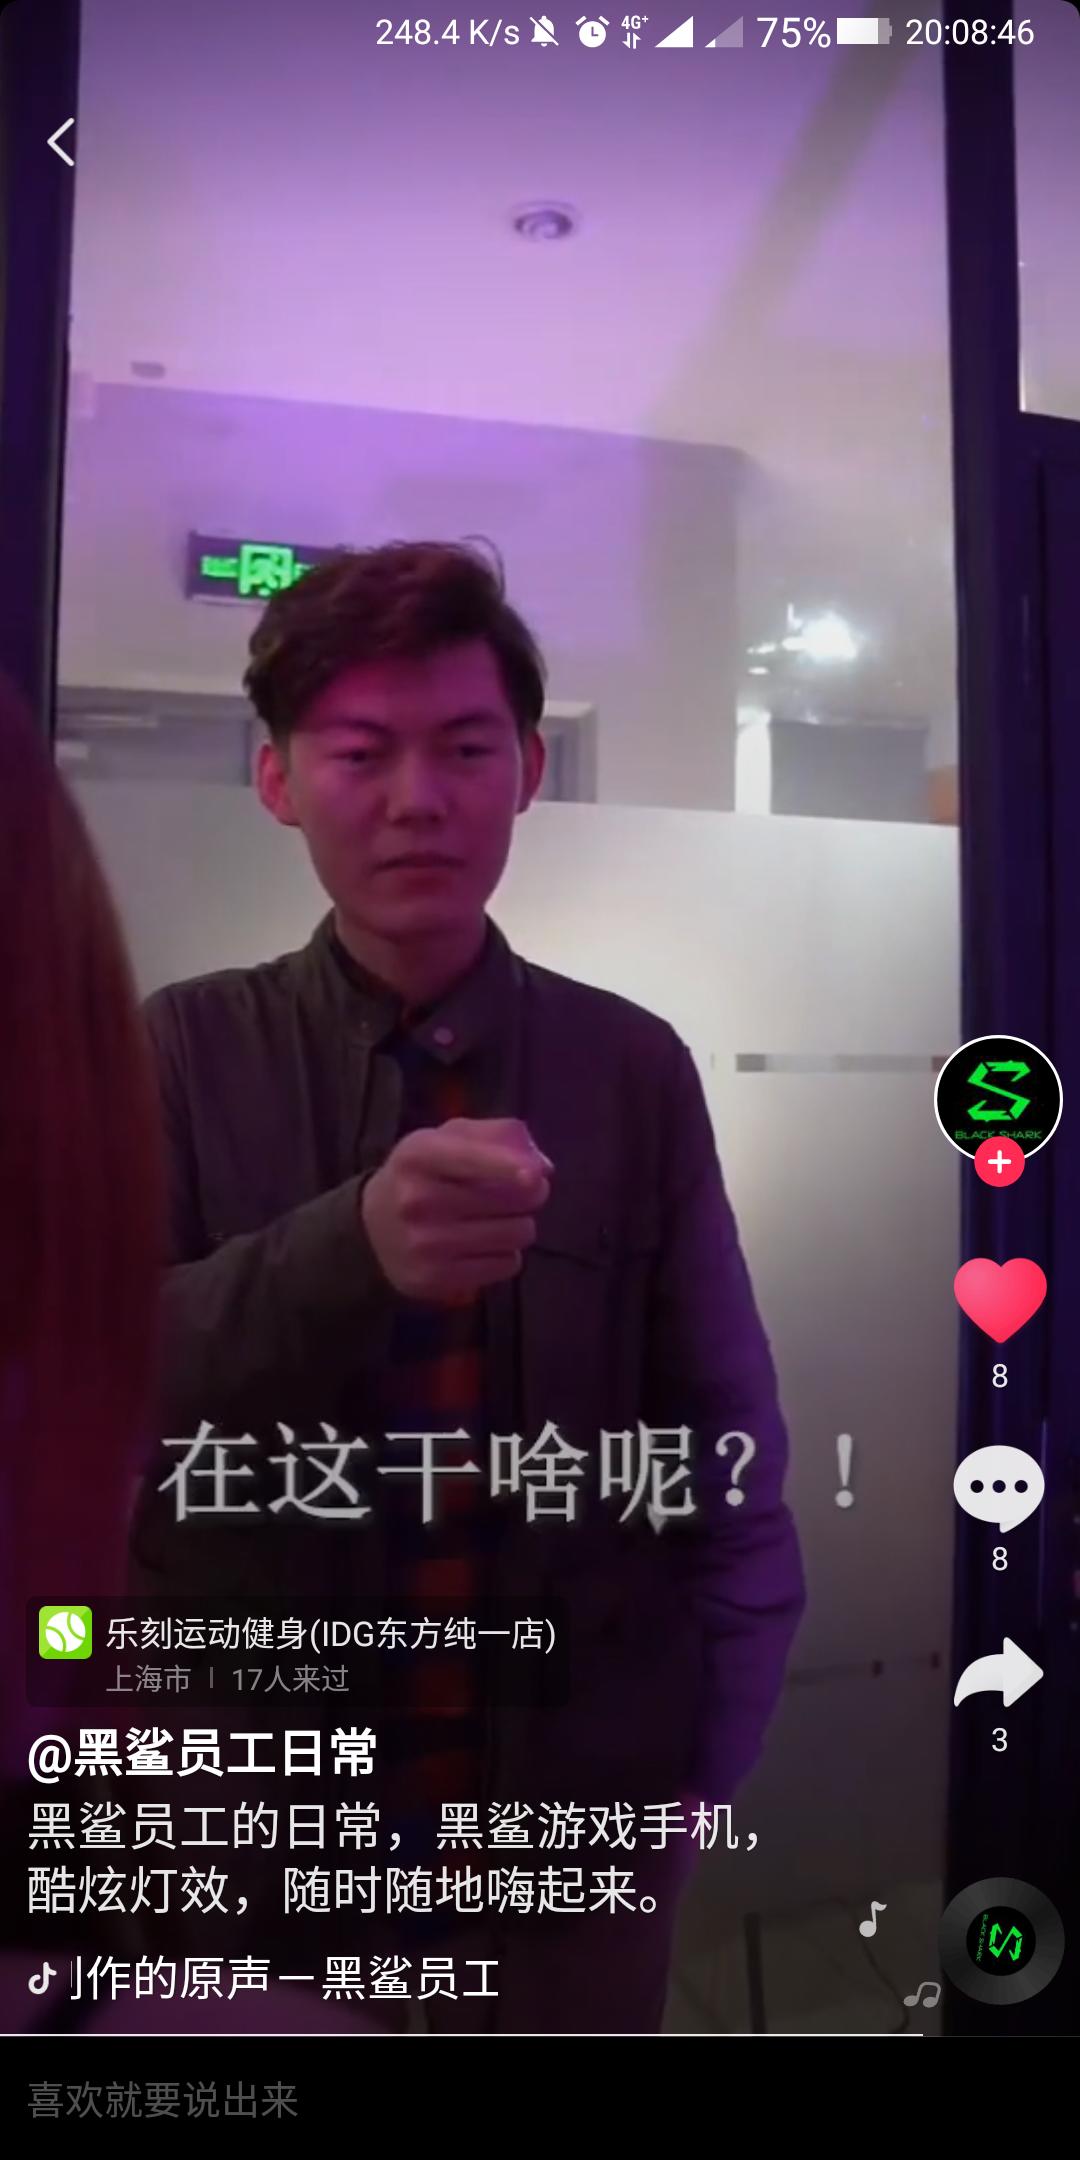 Screenshot_2019-05-14-20-08-46-973_com.ss.android.ugc.aweme.png